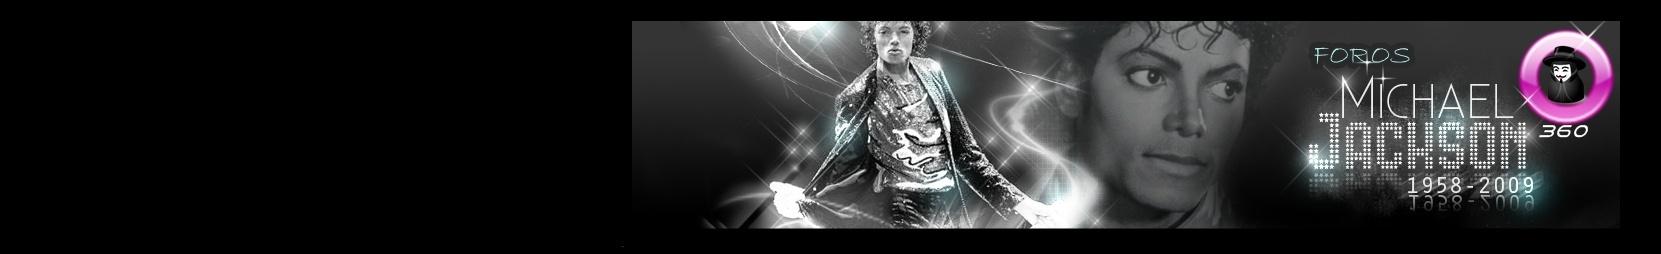 Michael Jackson 360 Forum..